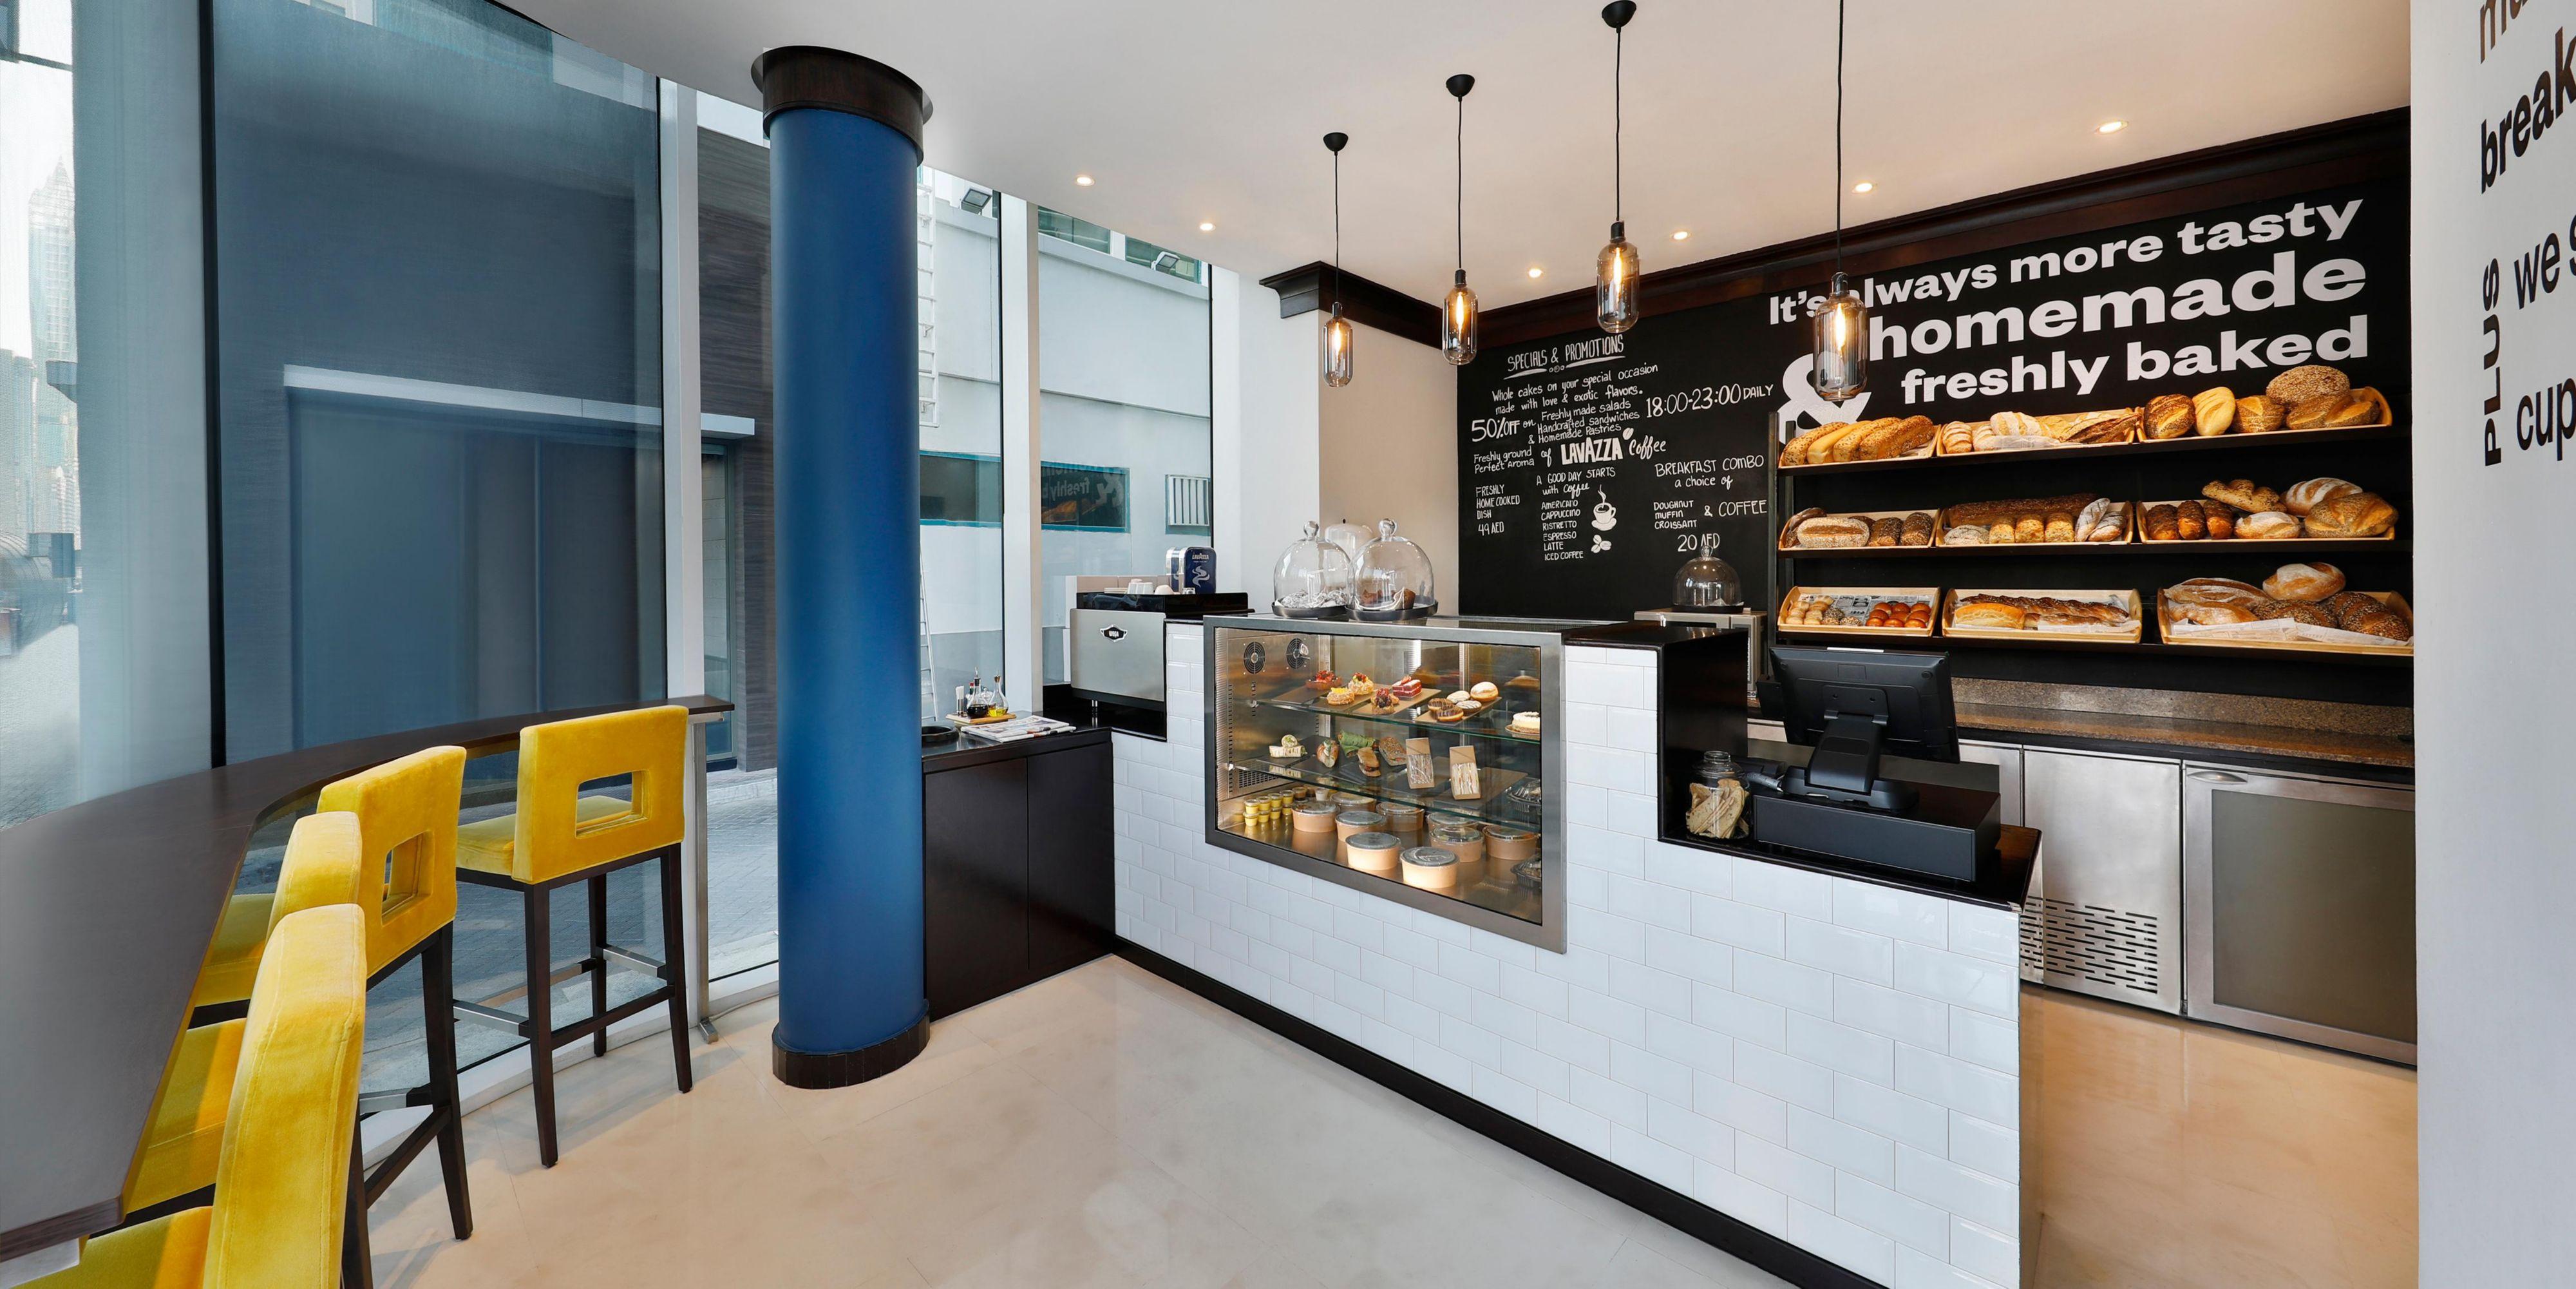 Corner Cafe, voco Dubai, Sheikh Zayed Road, Lavazza Coffee